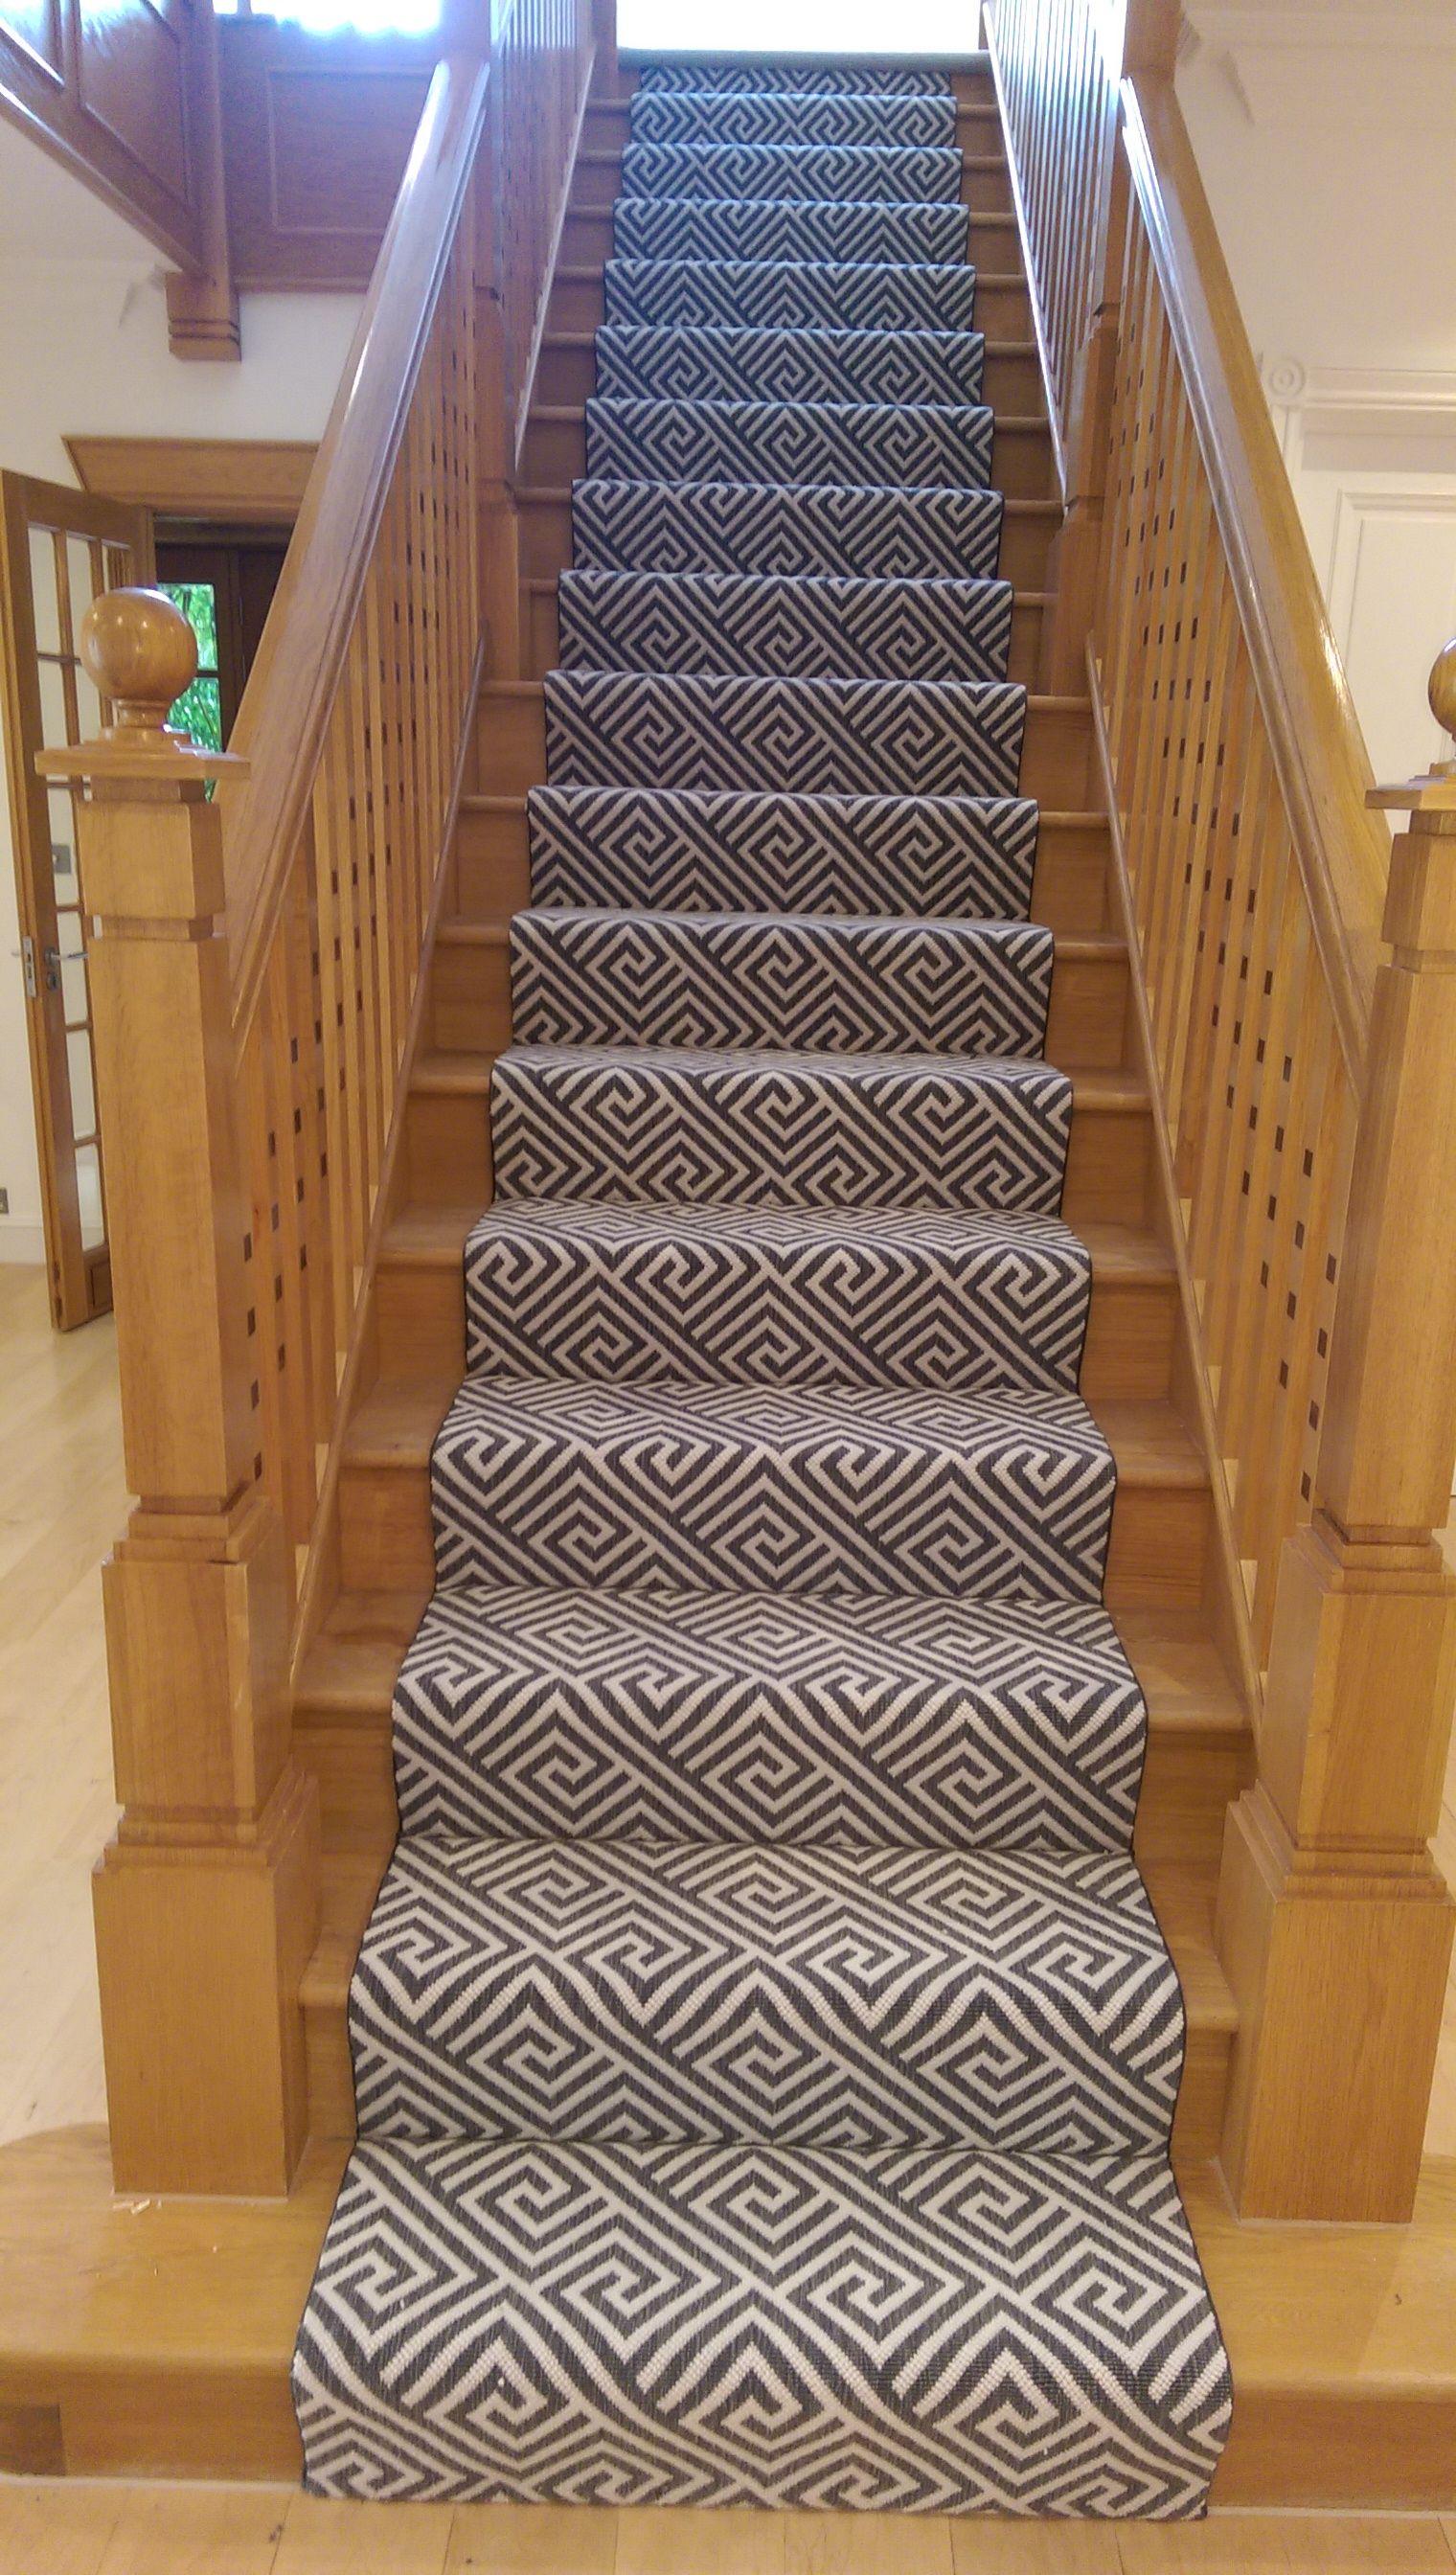 Geometric Grey White Stair Runner By B R Carpet Company Geo Grey White Runner Stairs Bandrcarpet Stair Runner Carpet Companies Stairs